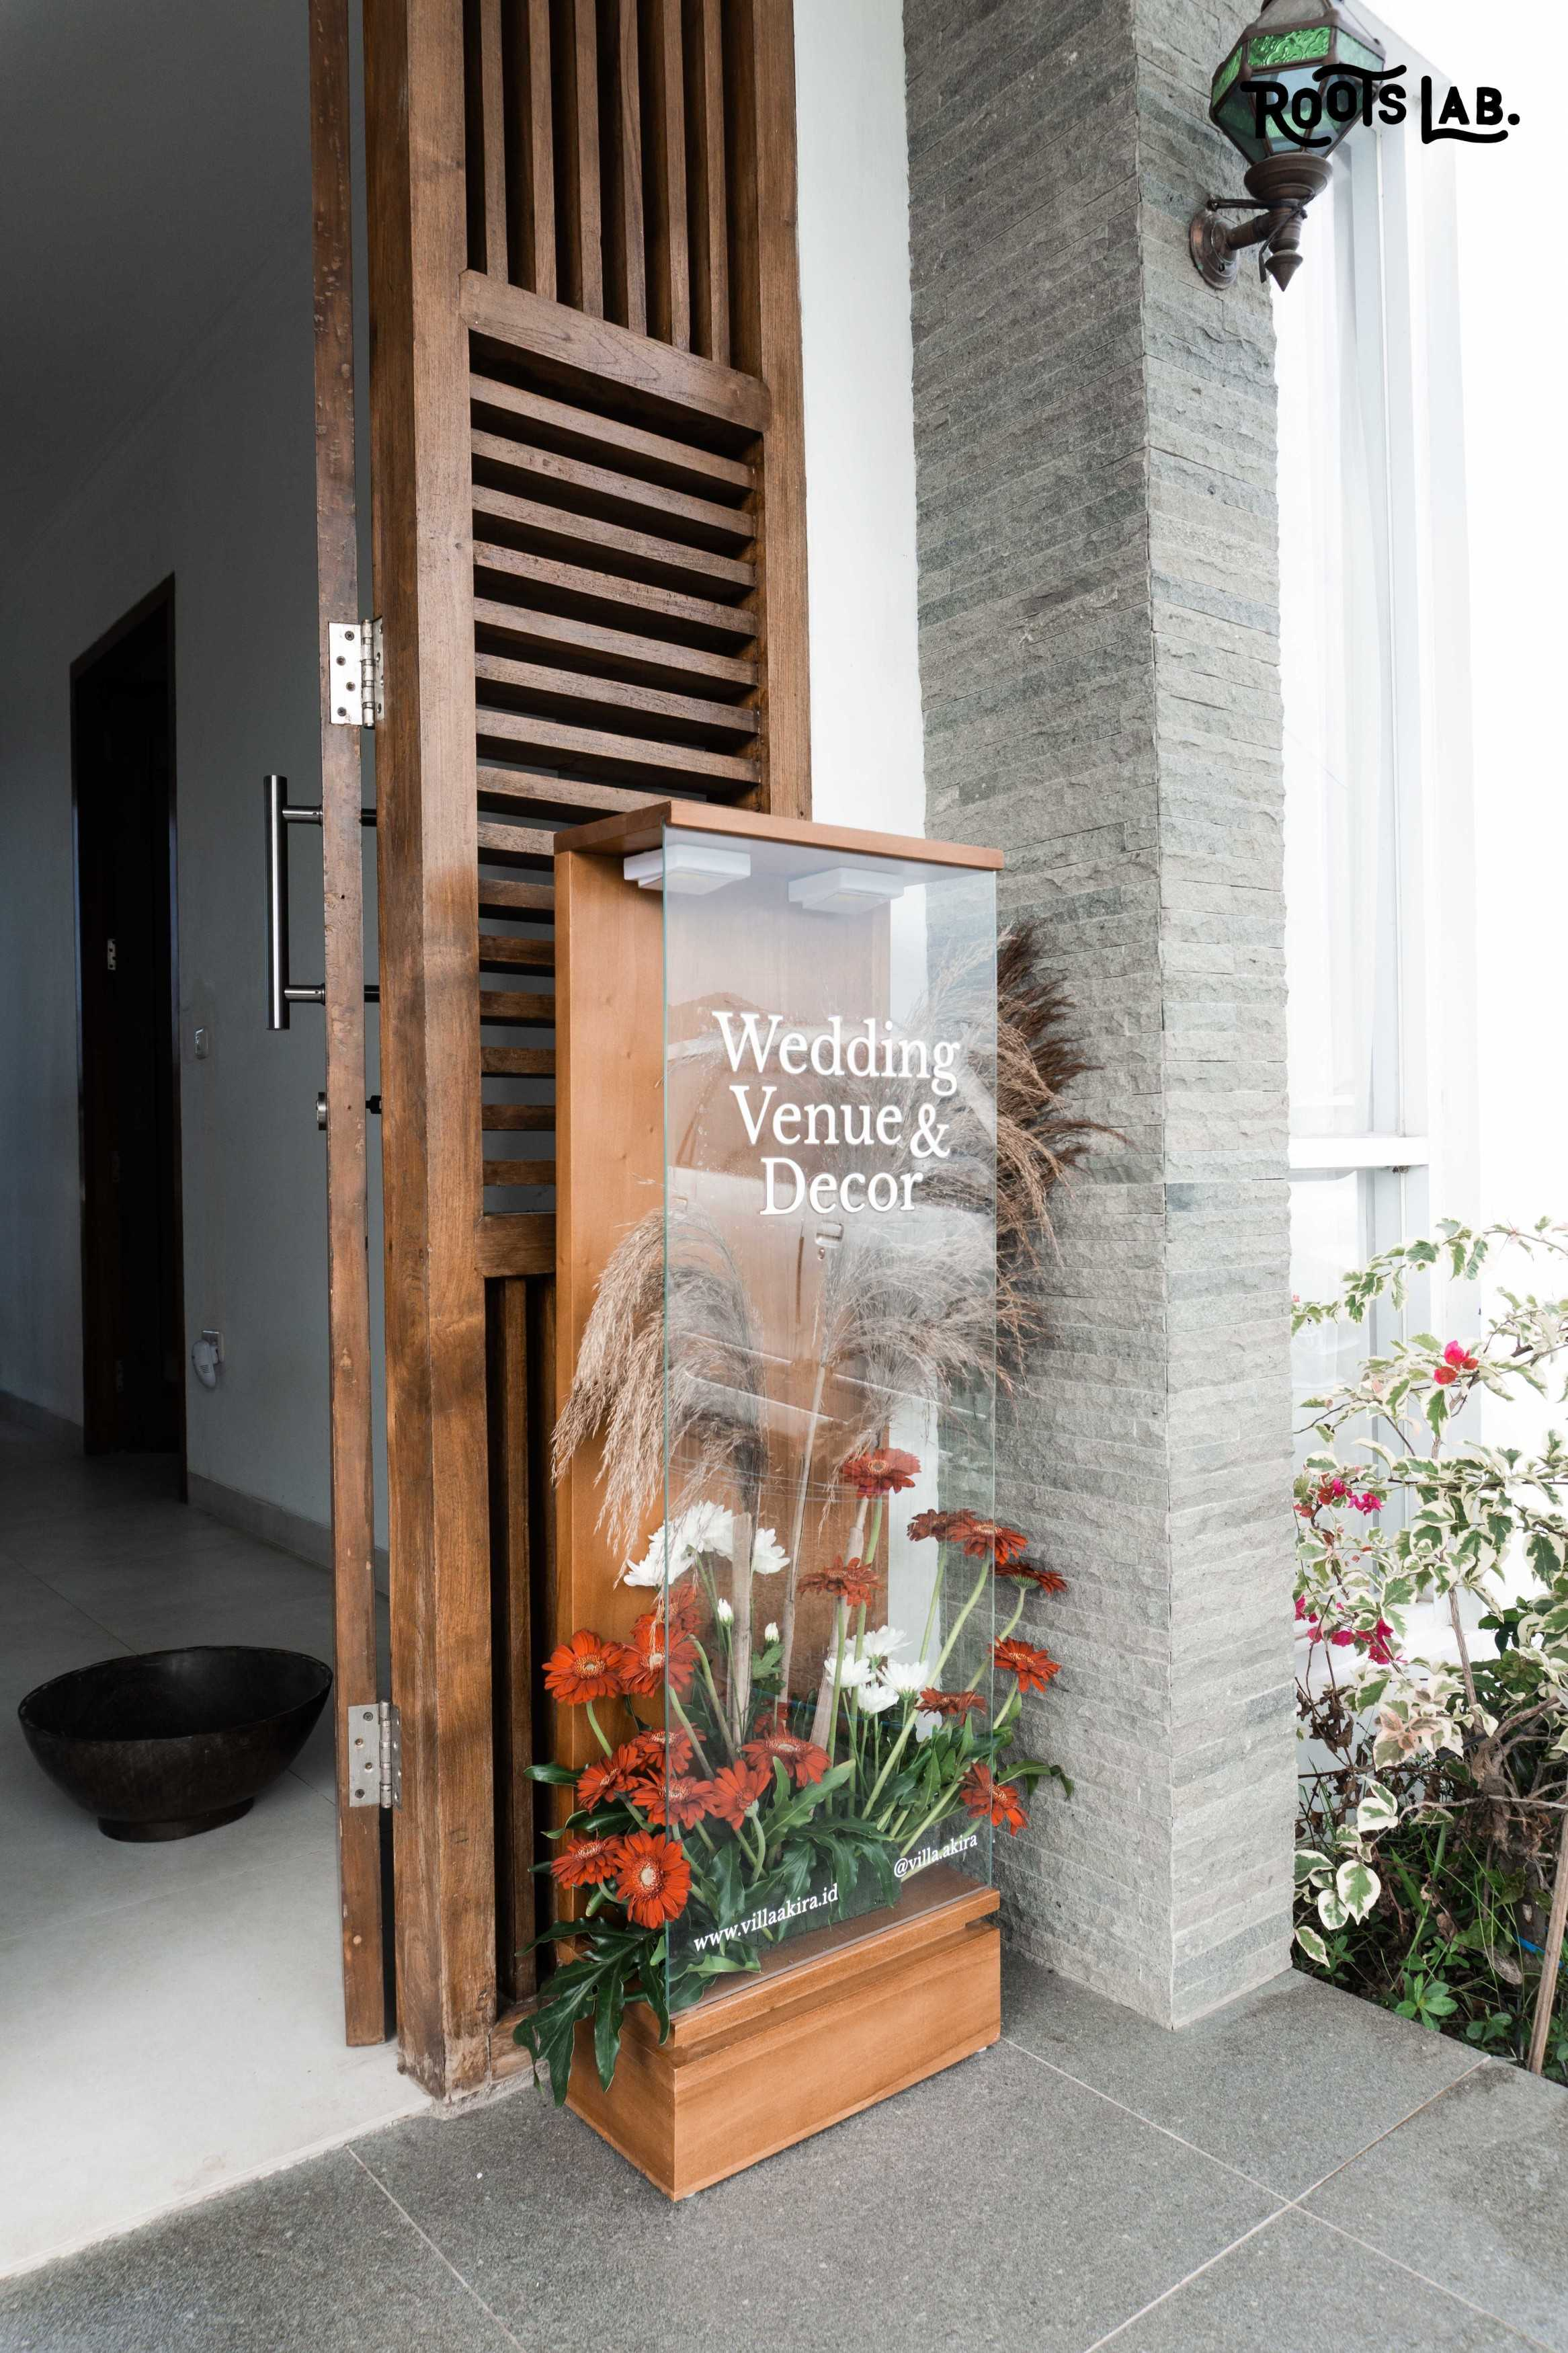 Rootslab Intimate Wedding Venue Villa Akira Megamendung, Kec. Megamendung, Bogor, Jawa Barat, Indonesia Megamendung, Kec. Megamendung, Bogor, Jawa Barat, Indonesia Rootslab-Intimate-Wedding-Venue-Villa-Akira   111409